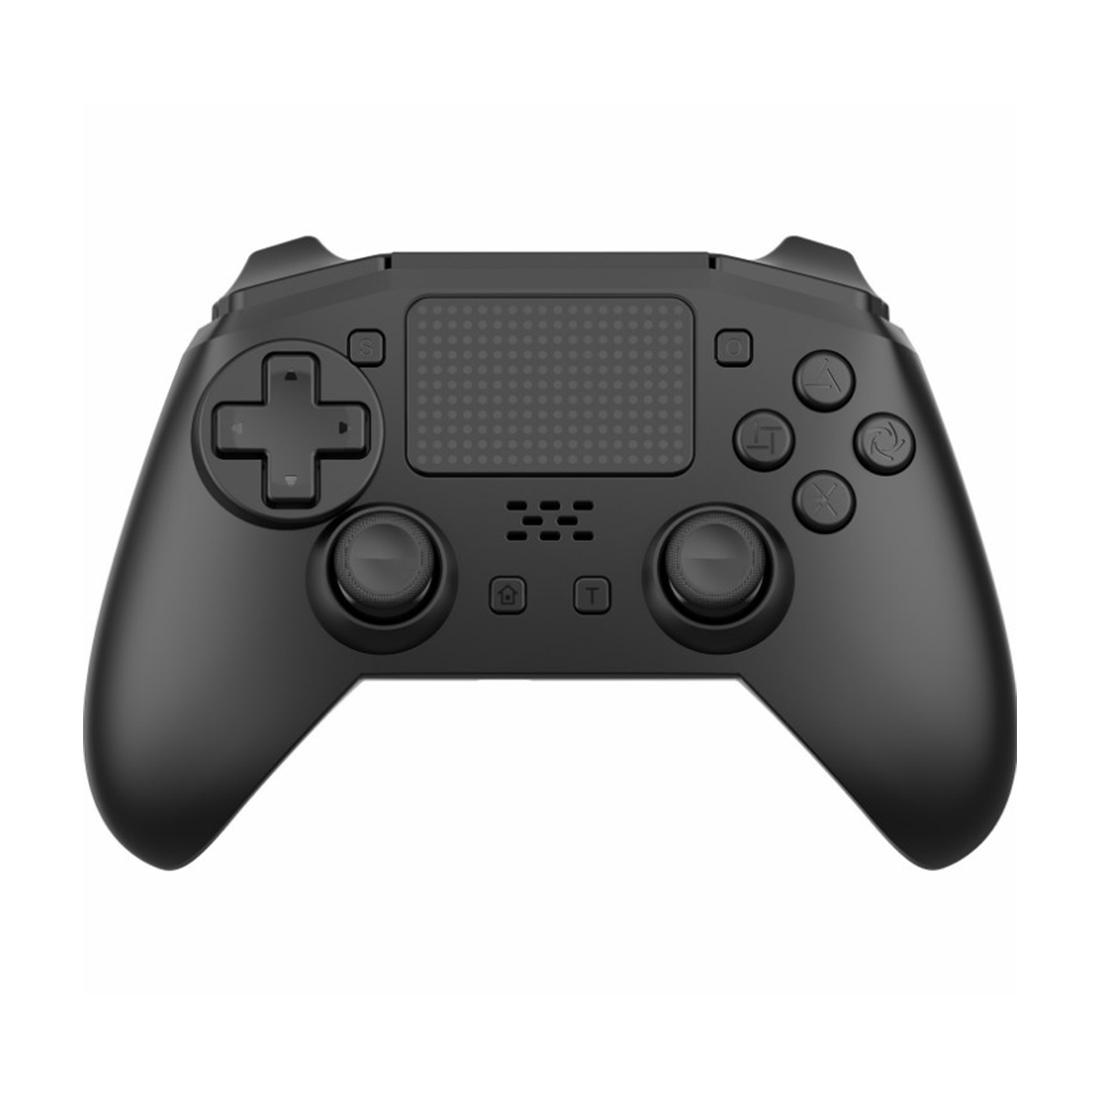 PS4 Wireless Controller Bluetooth Gamepad - Black